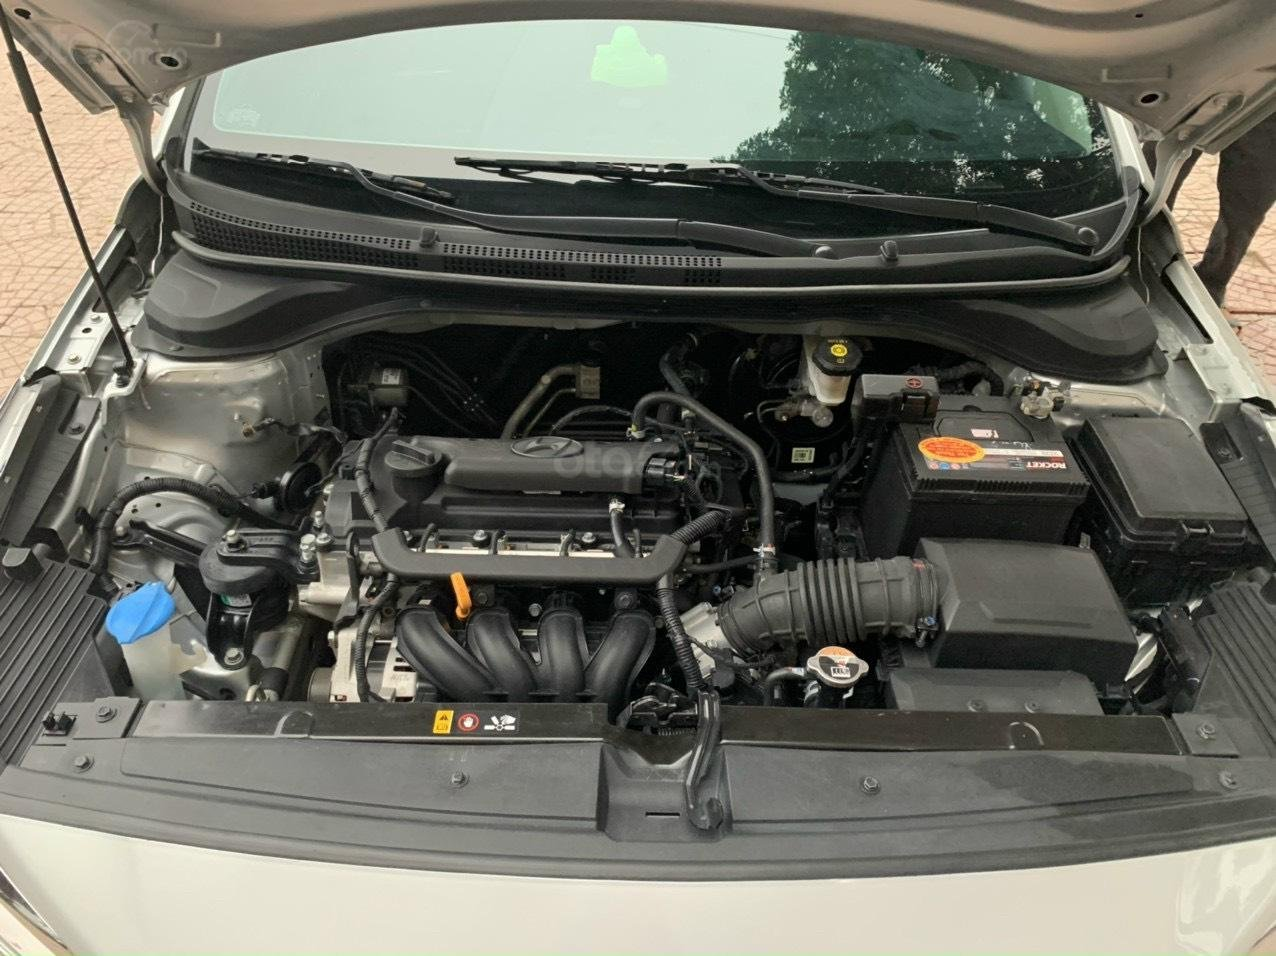 Cần bán Hyundai Accent 1.4 MT 2018 full đồ chơi (4)